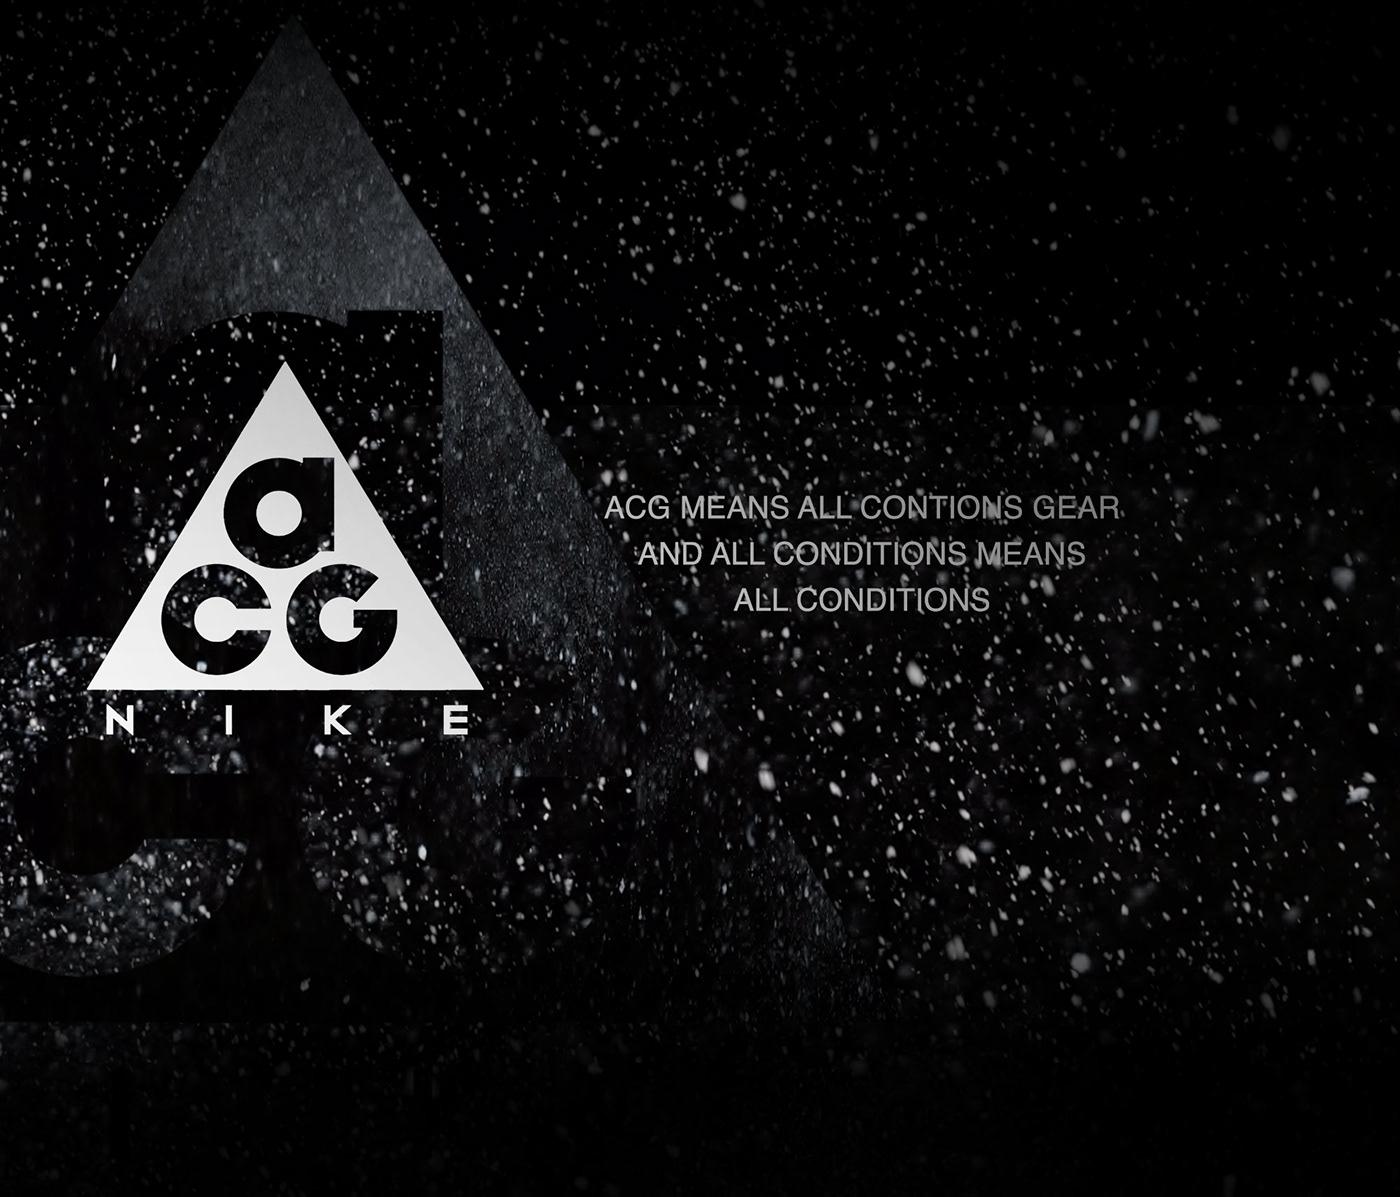 Acronym ACNRM stone island shadow project Nike acg animation  motion graphics  branding  TECHWEAR